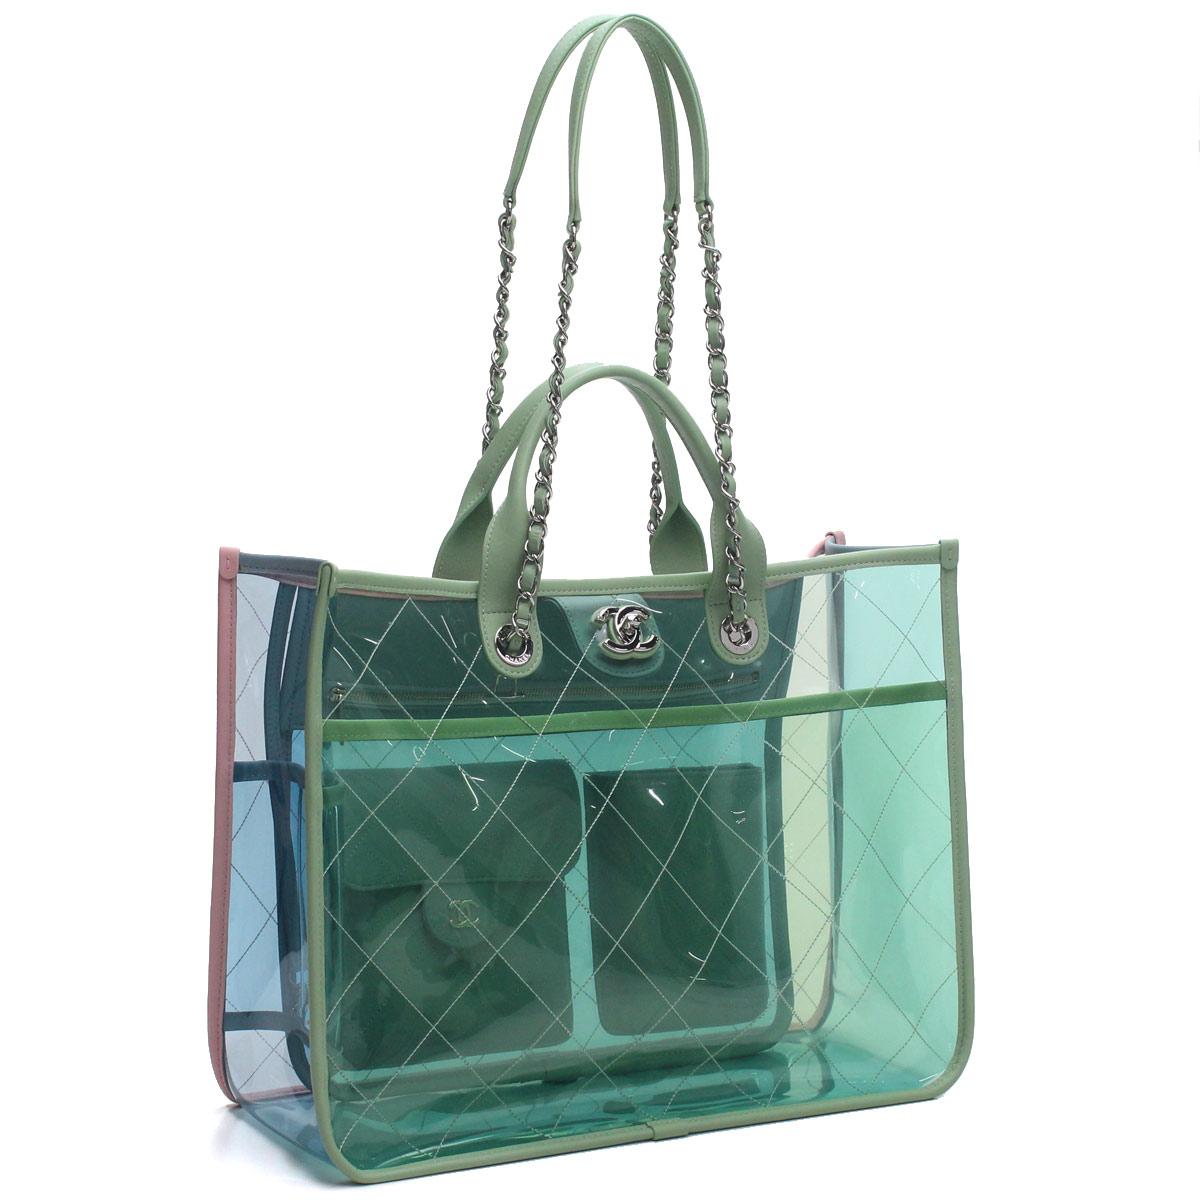 f52de00324c3 Bighit The total brand wholesale: Chanel CHANEL clear PVC large shopping bag  tote bag A57411 green system | Rakuten Global Market